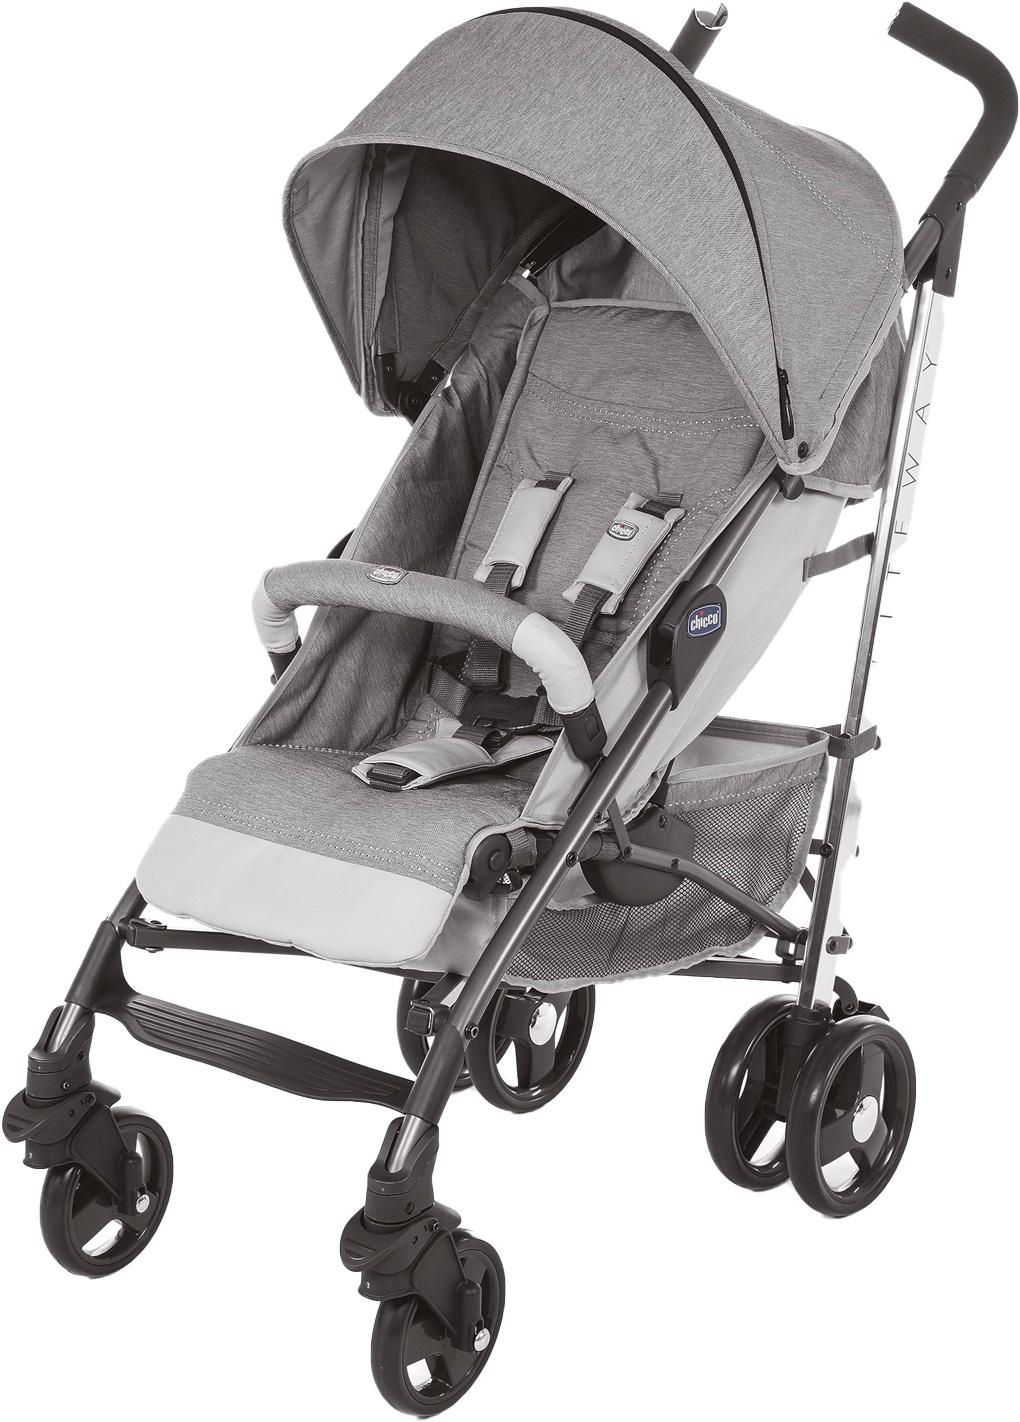 Коляска прогулочная Chicco 95501 светло-серый